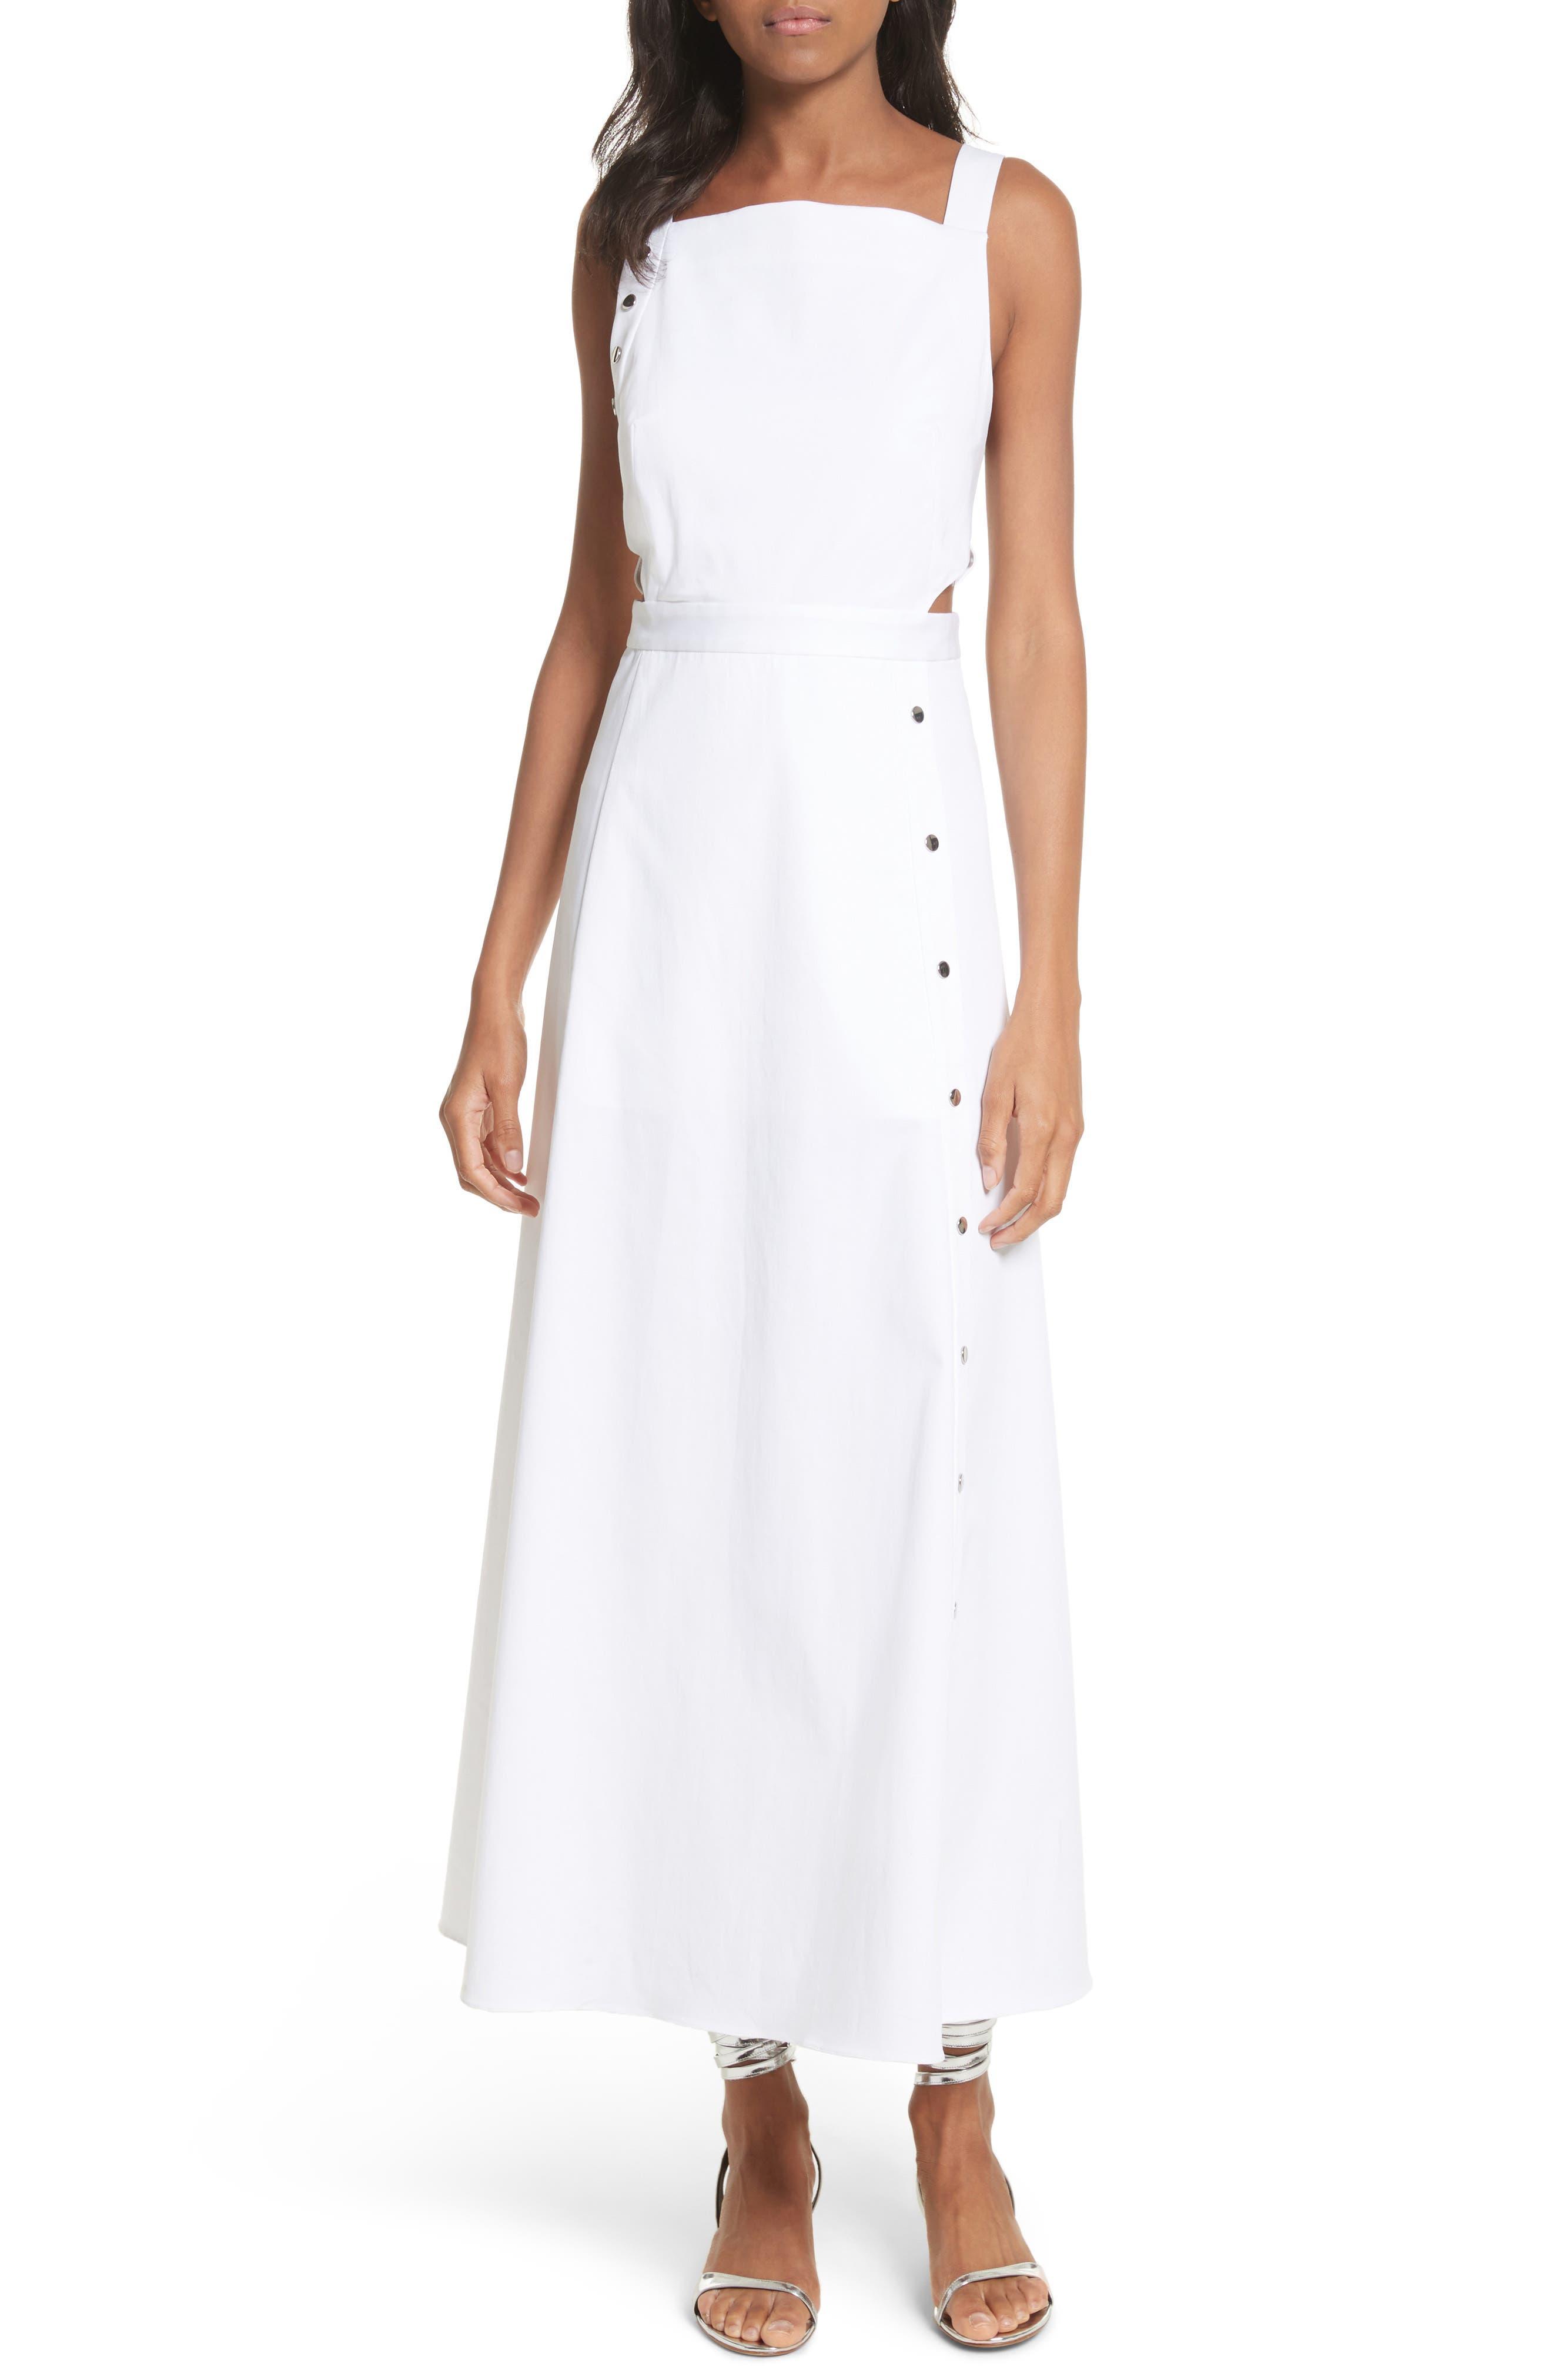 Crosby Snap Strappy Dress,                             Main thumbnail 1, color,                             White